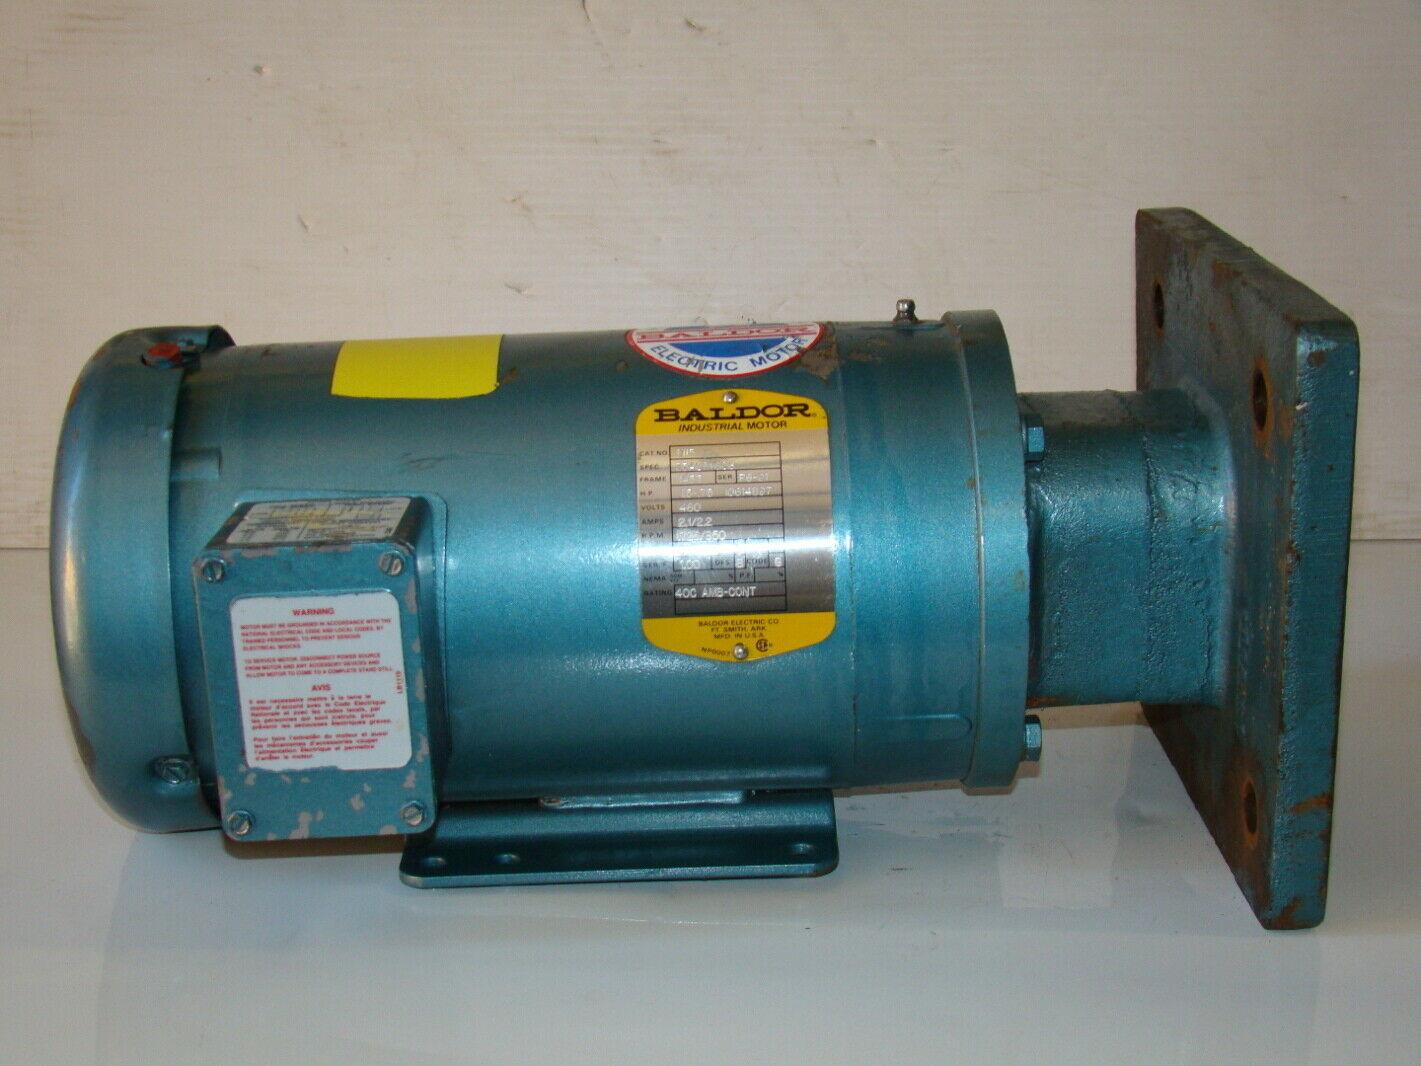 Baldor 1 5hp Electric Motor M15 Joseph Fazzio Incorporated